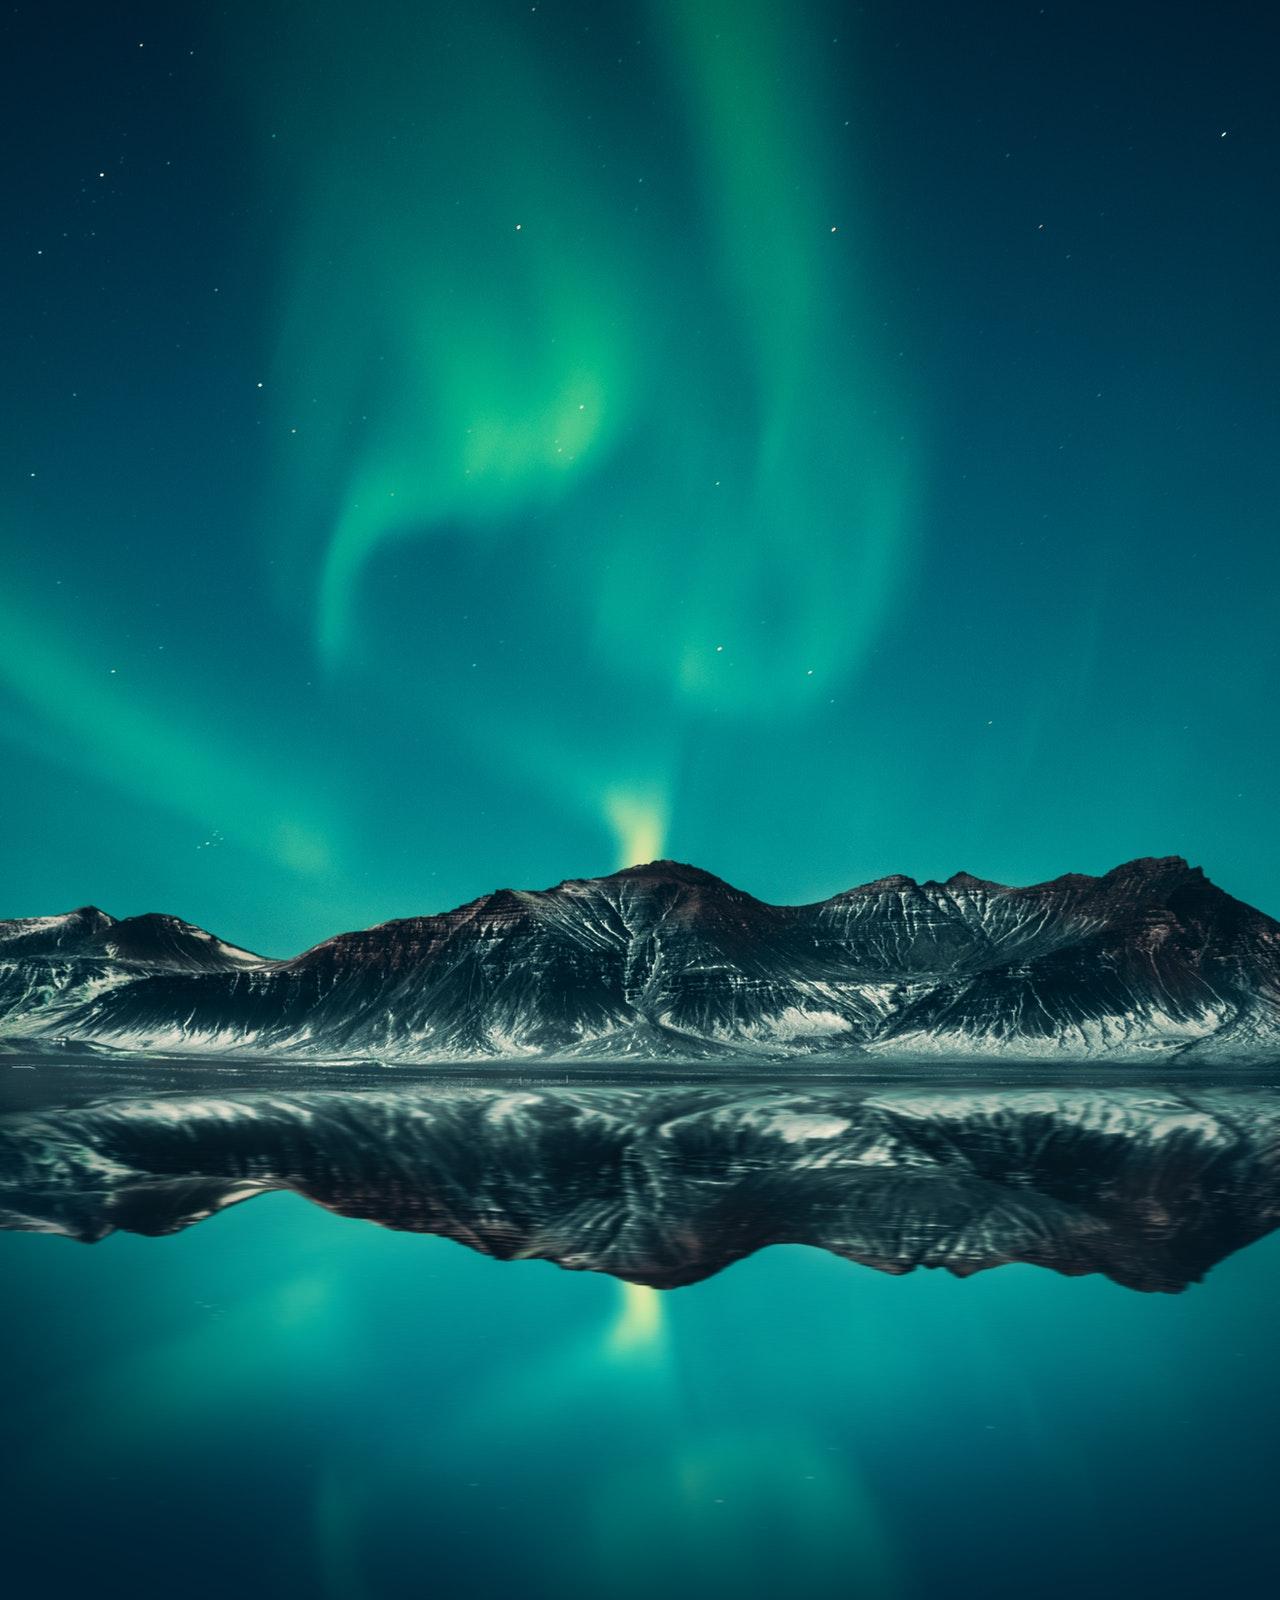 northern lights aurora borealis www.atozmomm.com